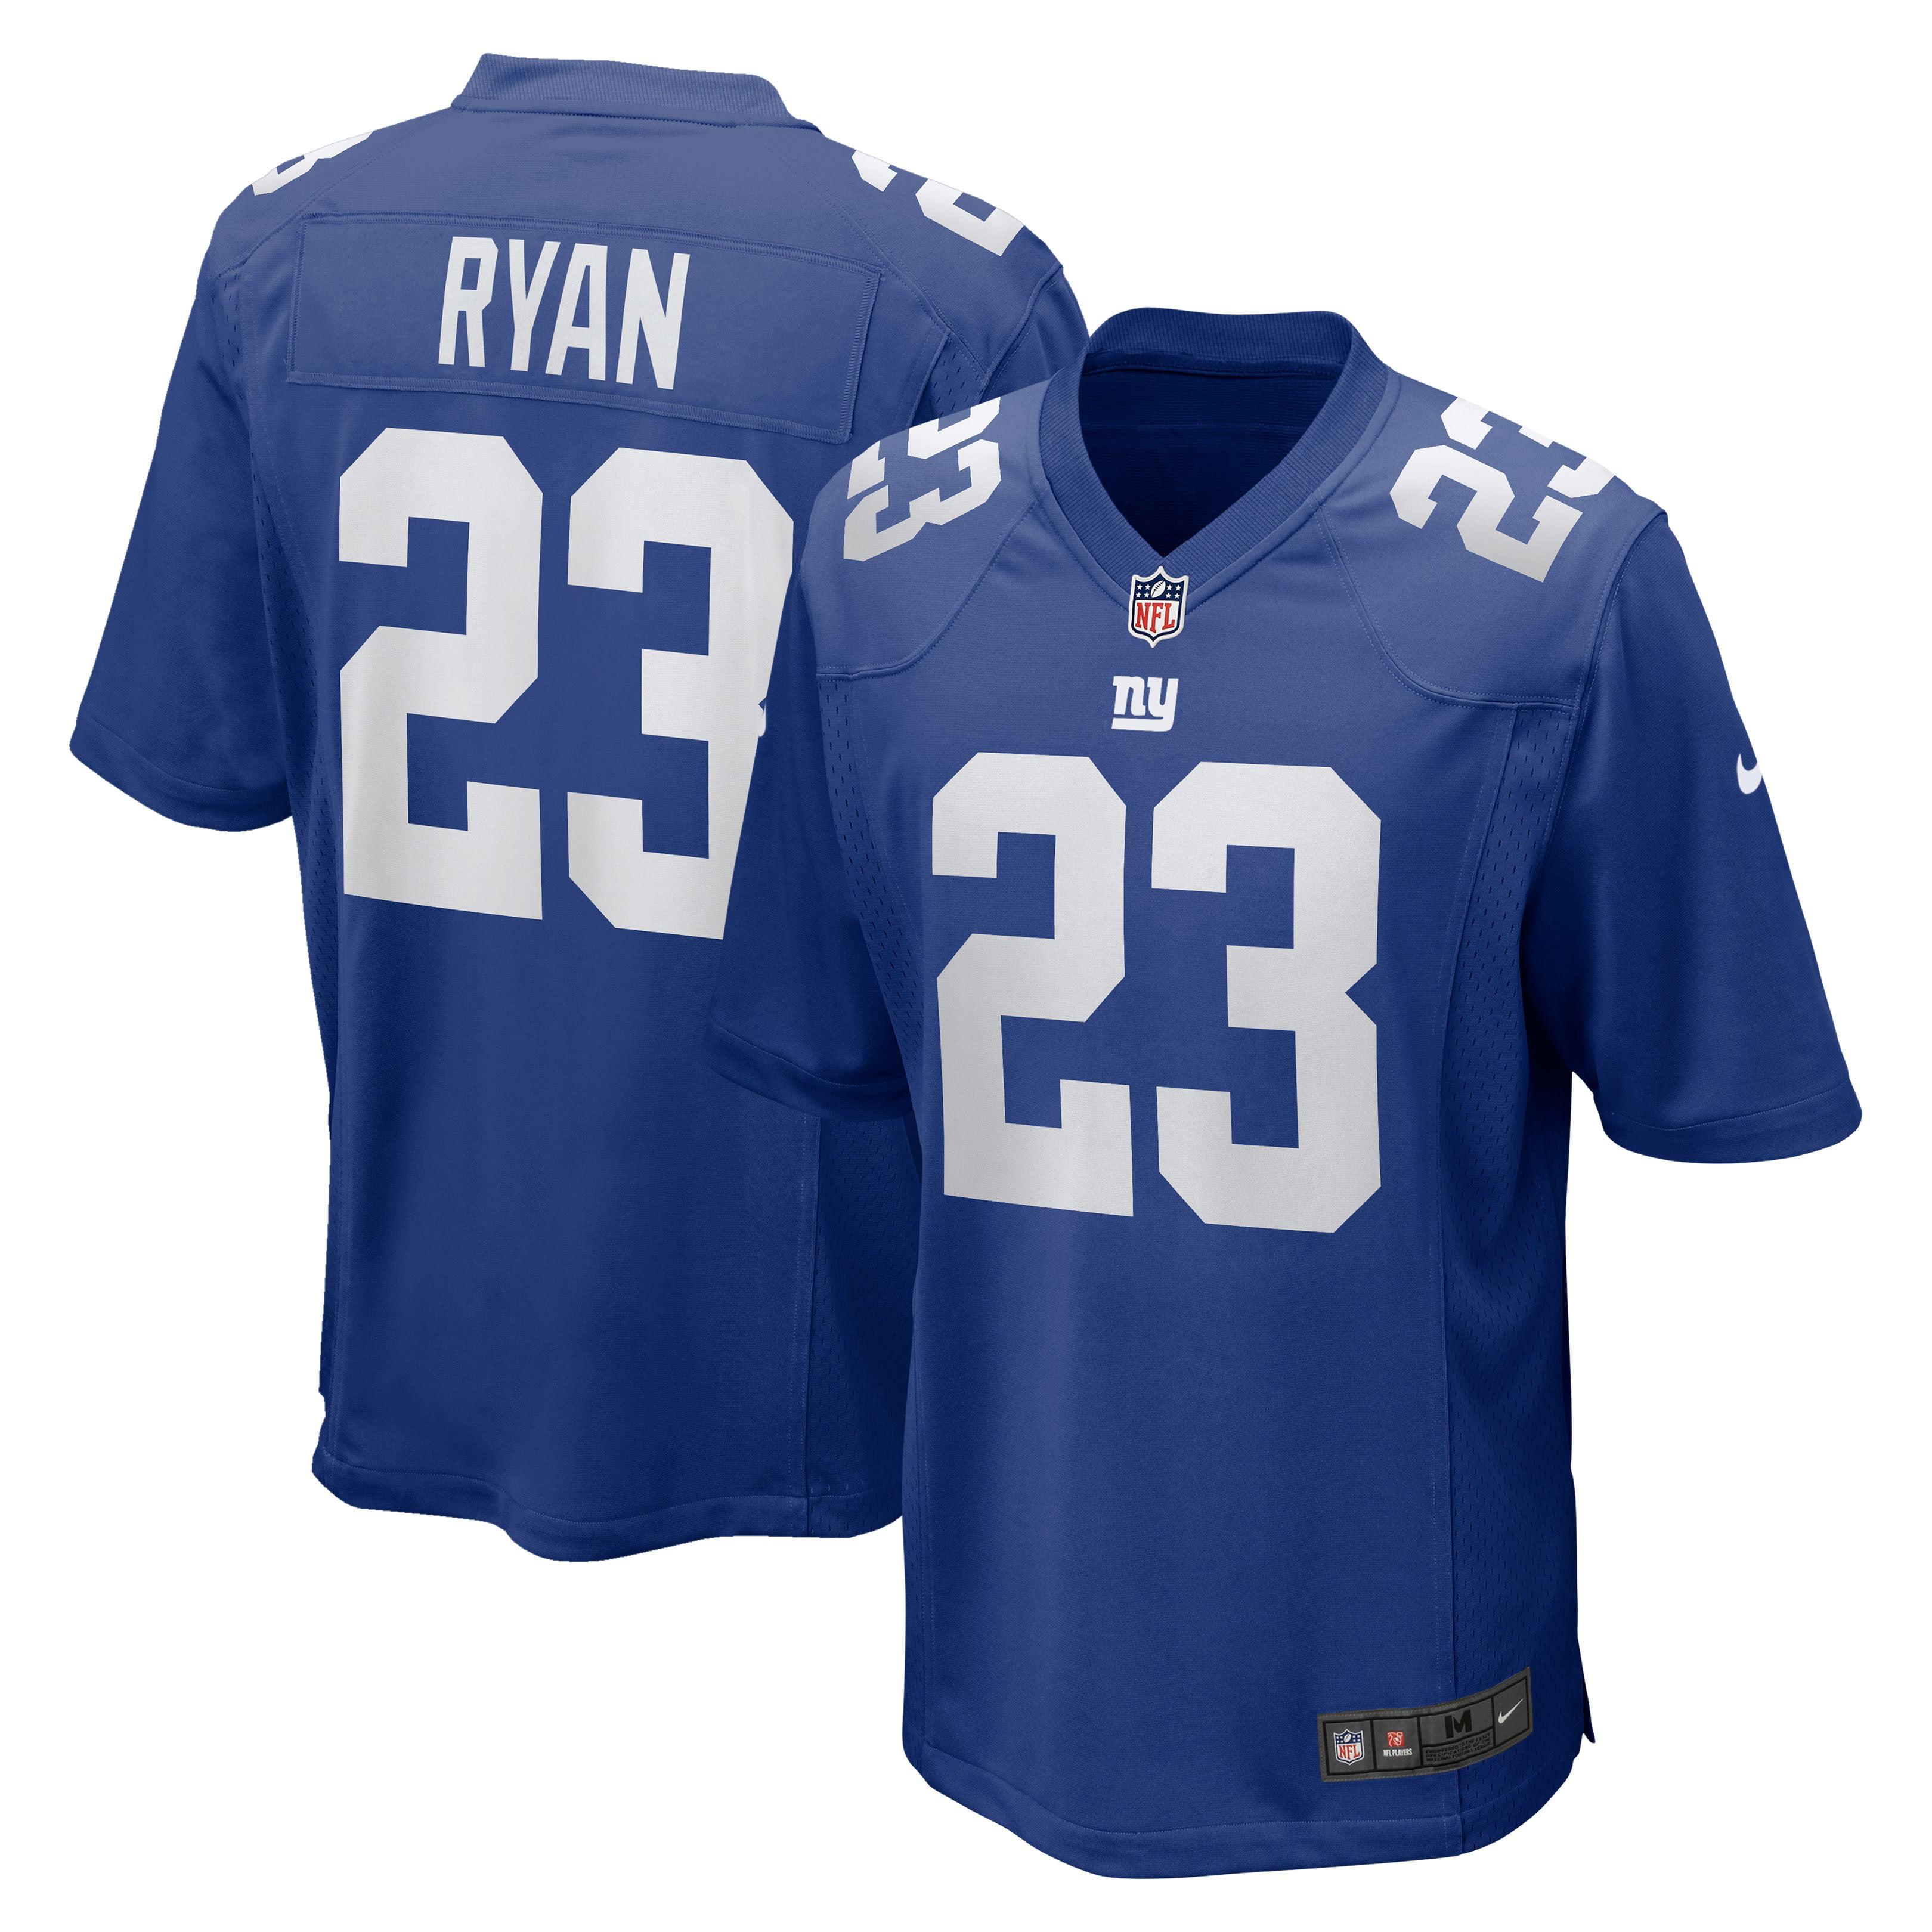 Logan Ryan New York Giants Nike Team Game Jersey - Royal - Walmart.com